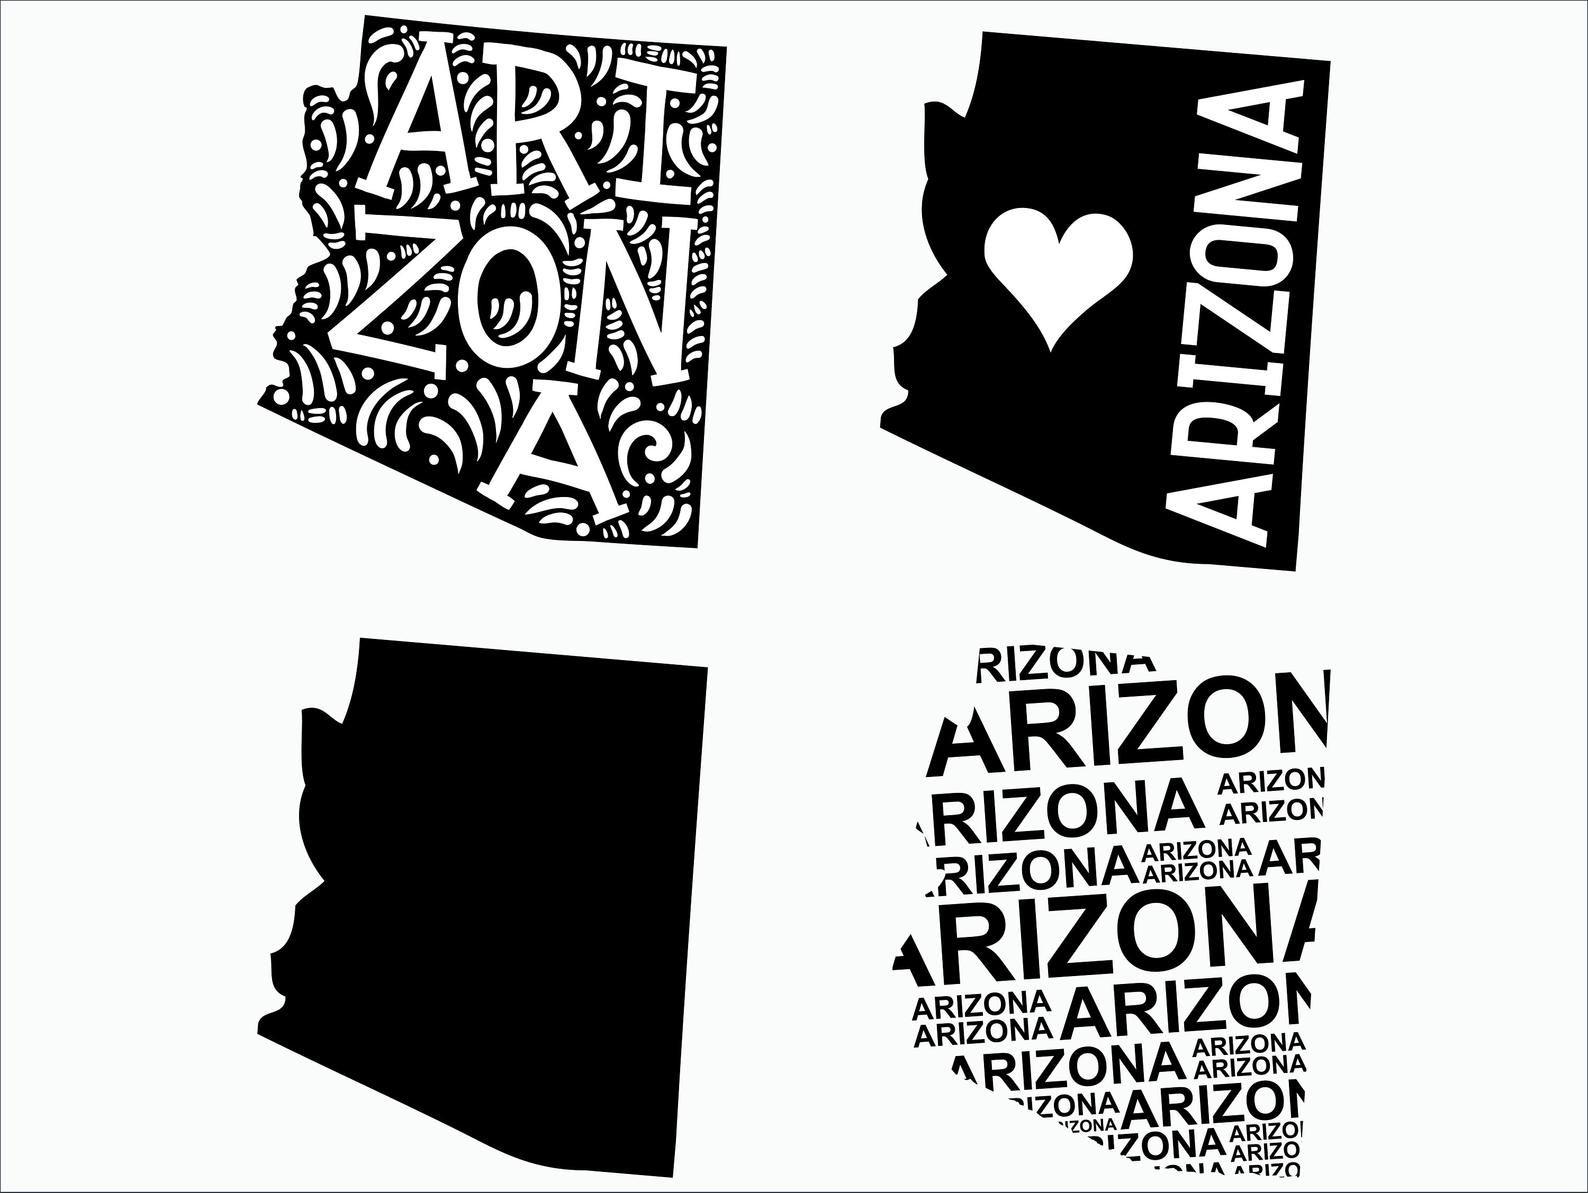 Arizona Svg Arizona Clipart Arizona State Svg Cricut Etsy Clip Art Svg Cricut